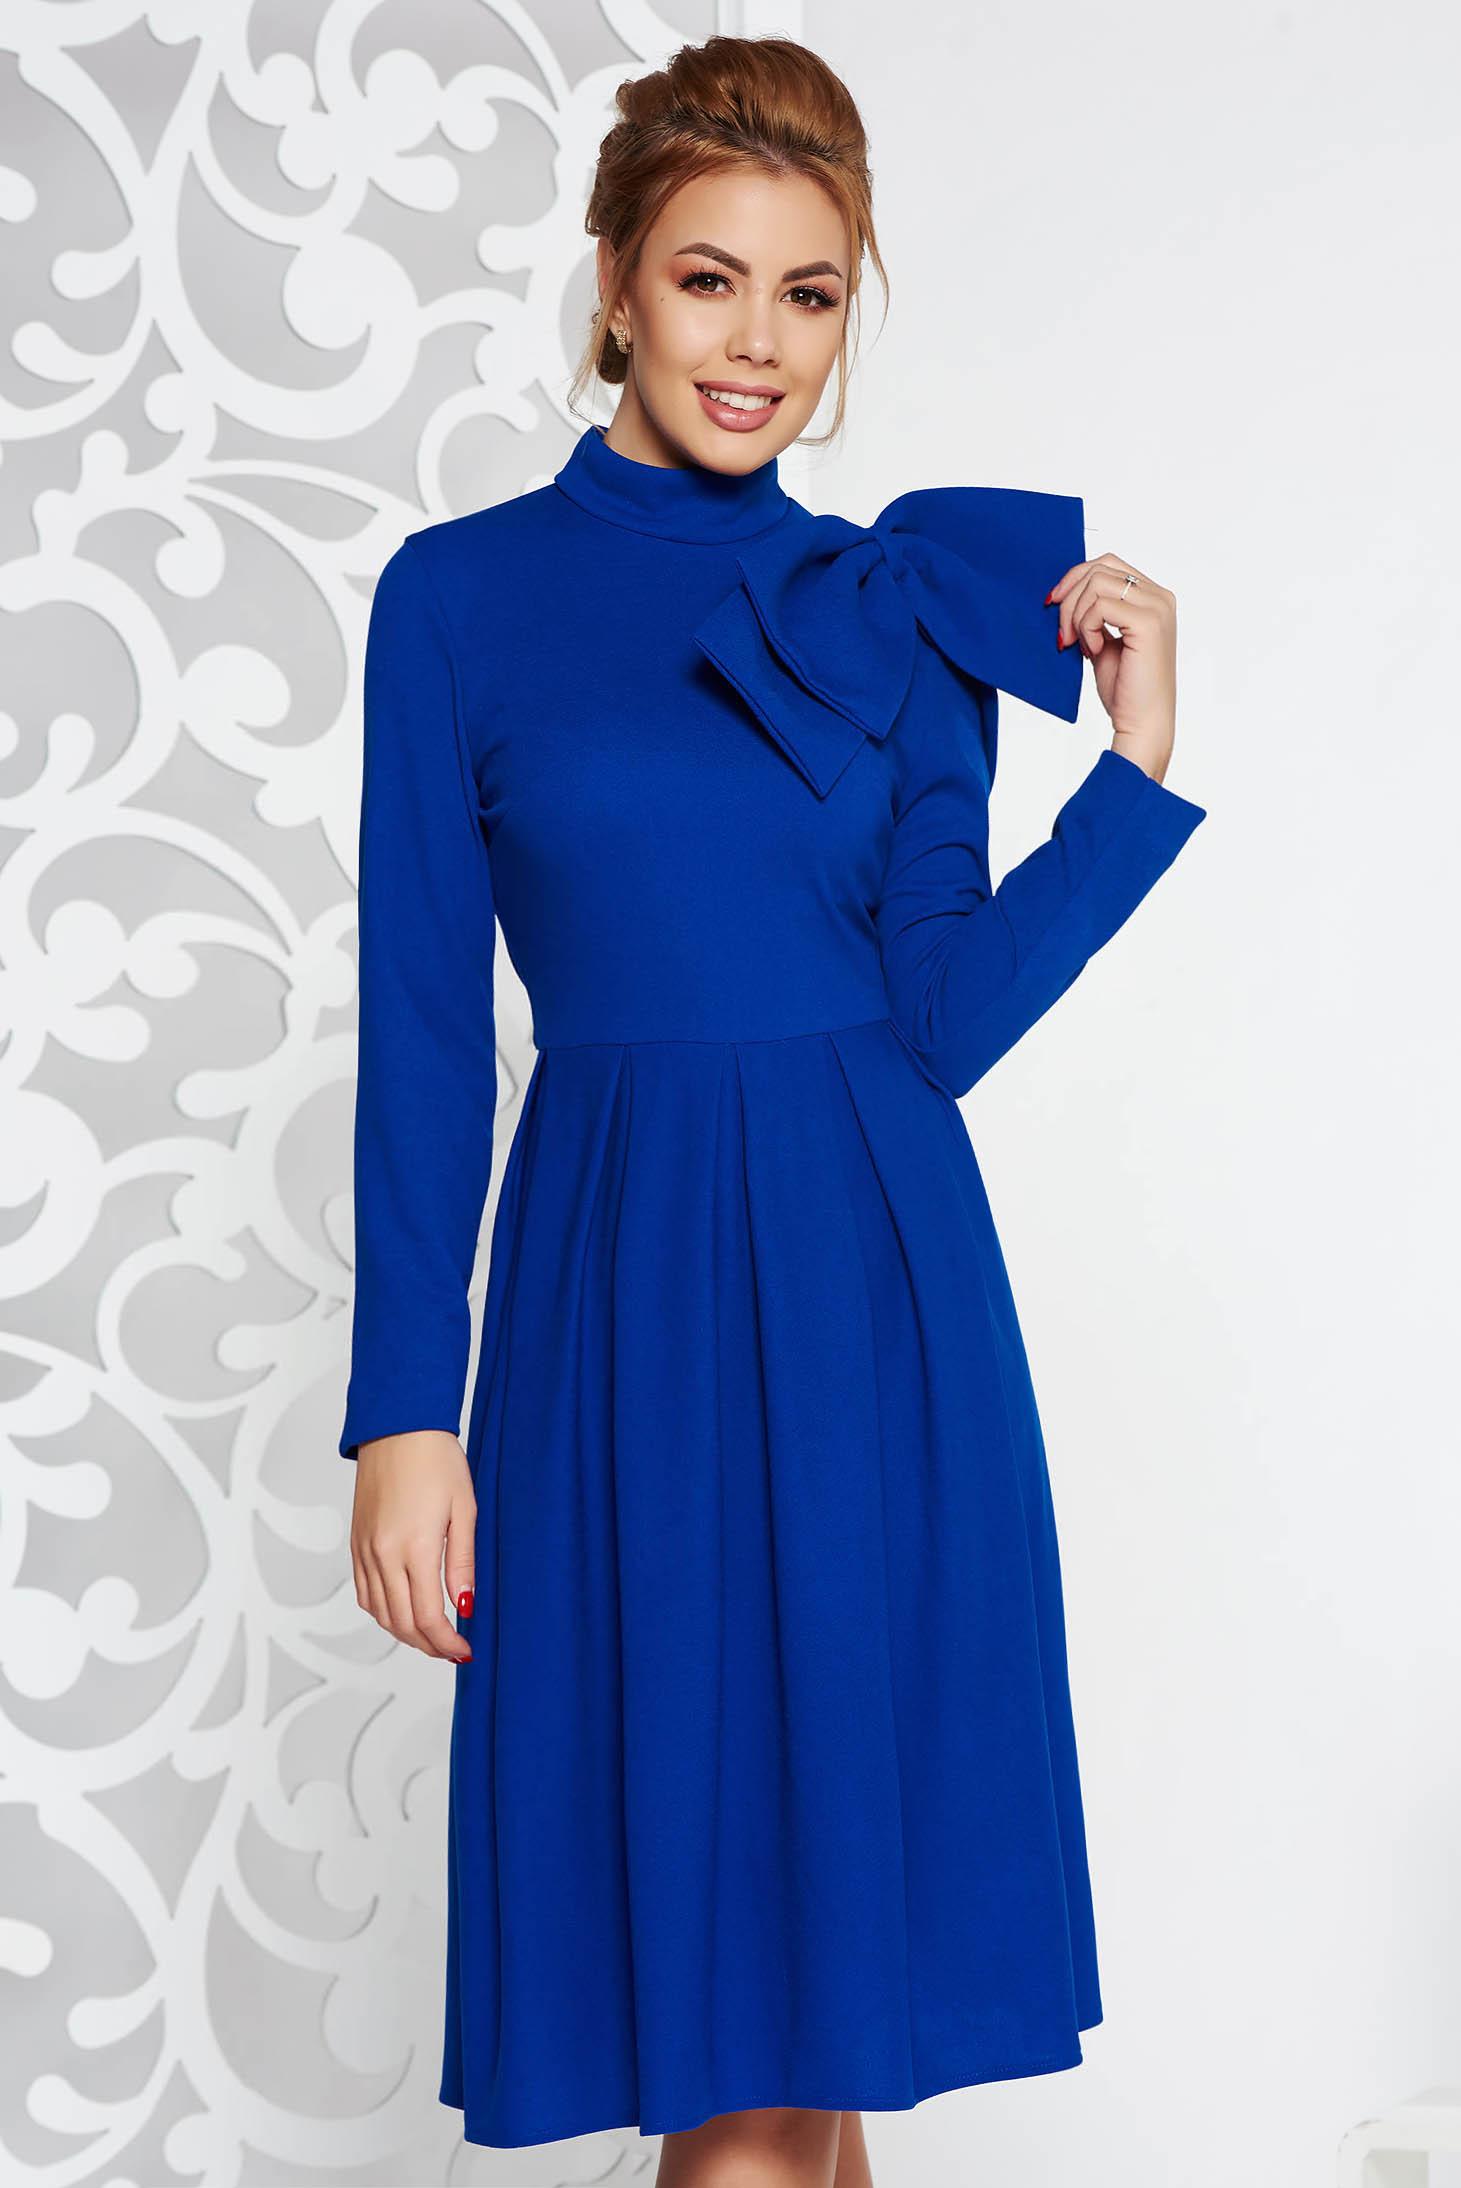 Blue elegant cloche dress slightly elastic fabric bow accessory